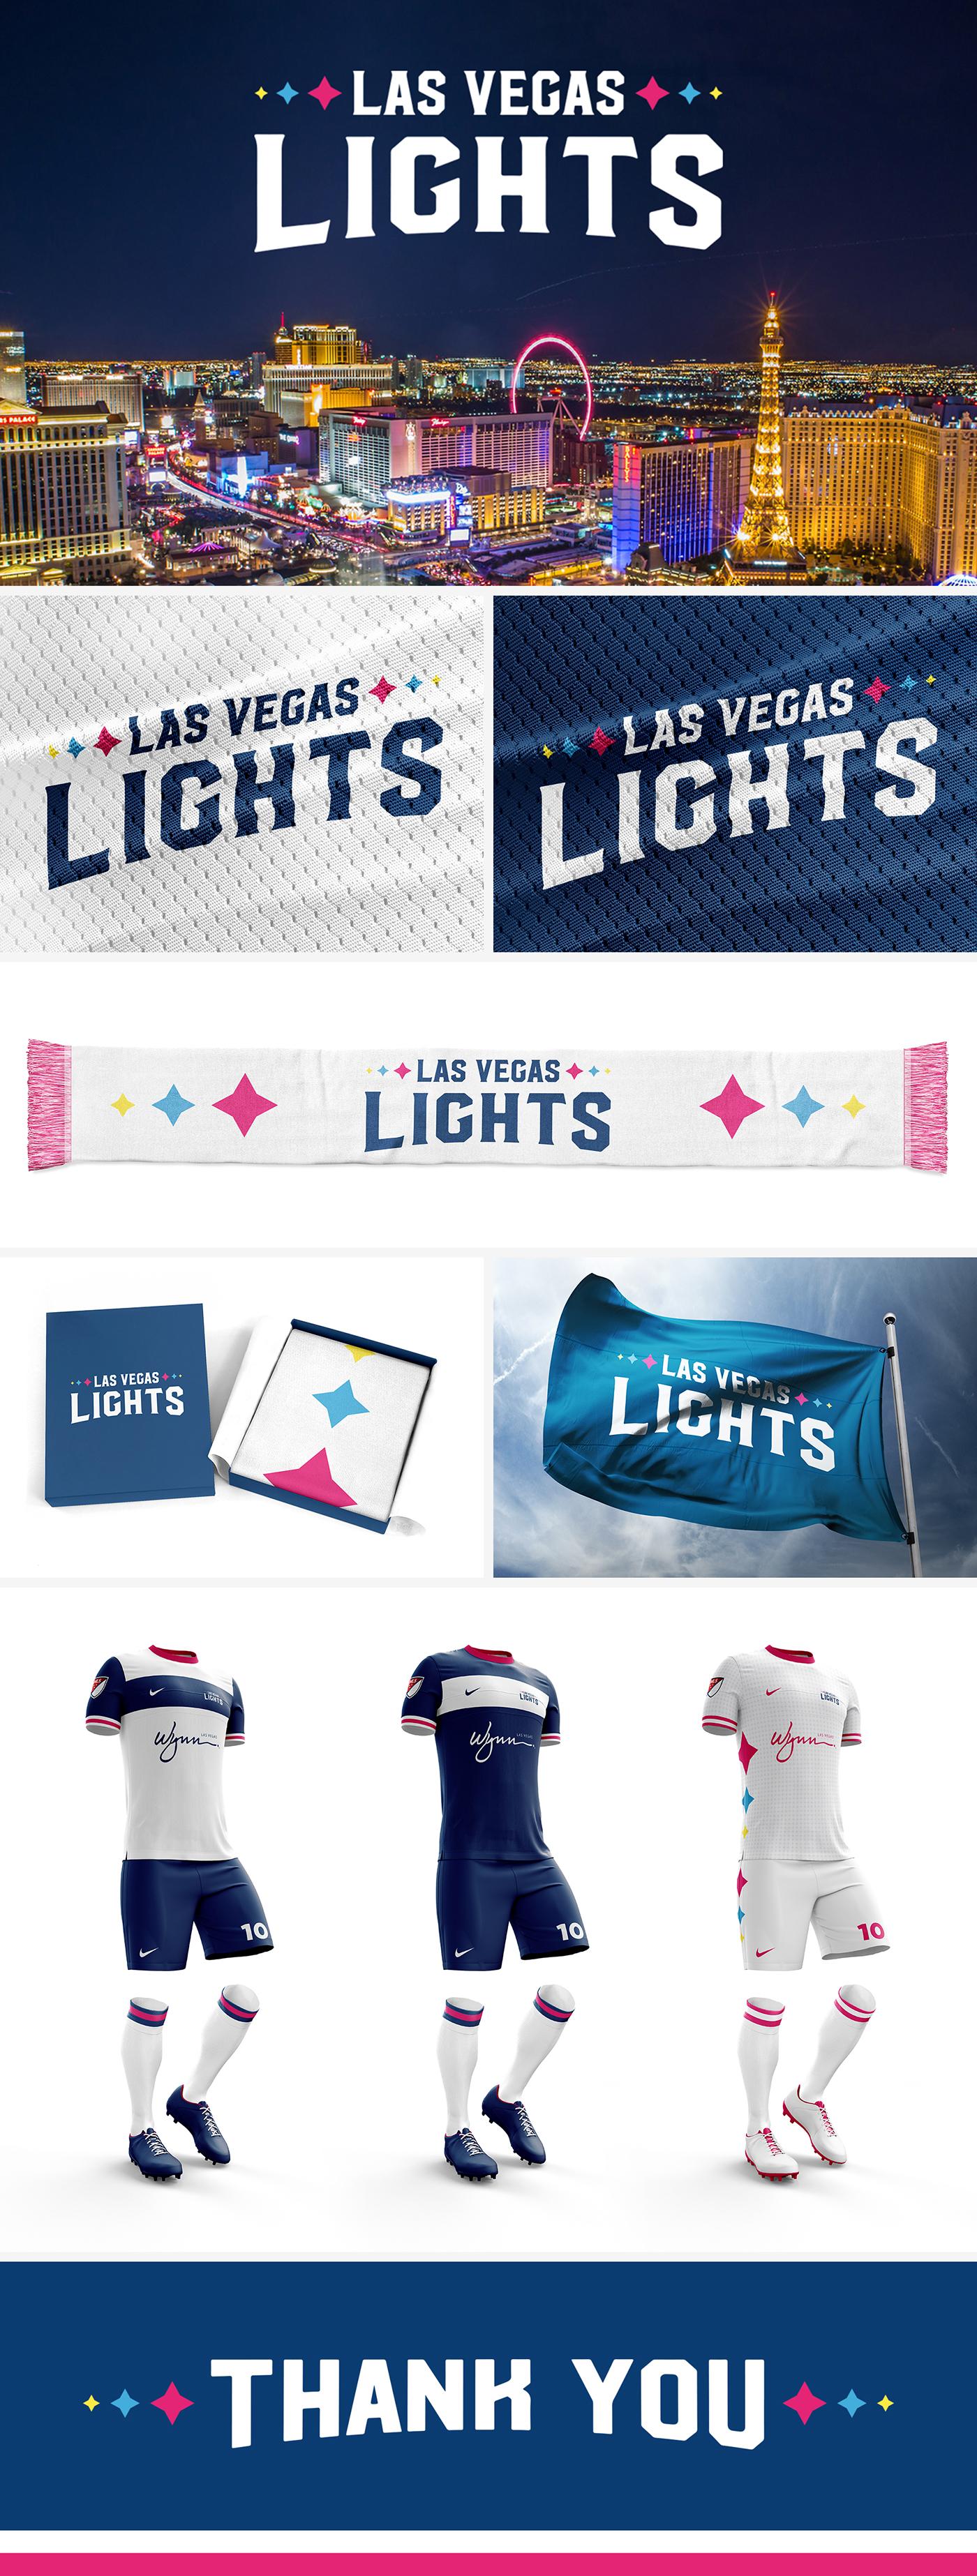 Las Vegas Lights FC Branding on Behance